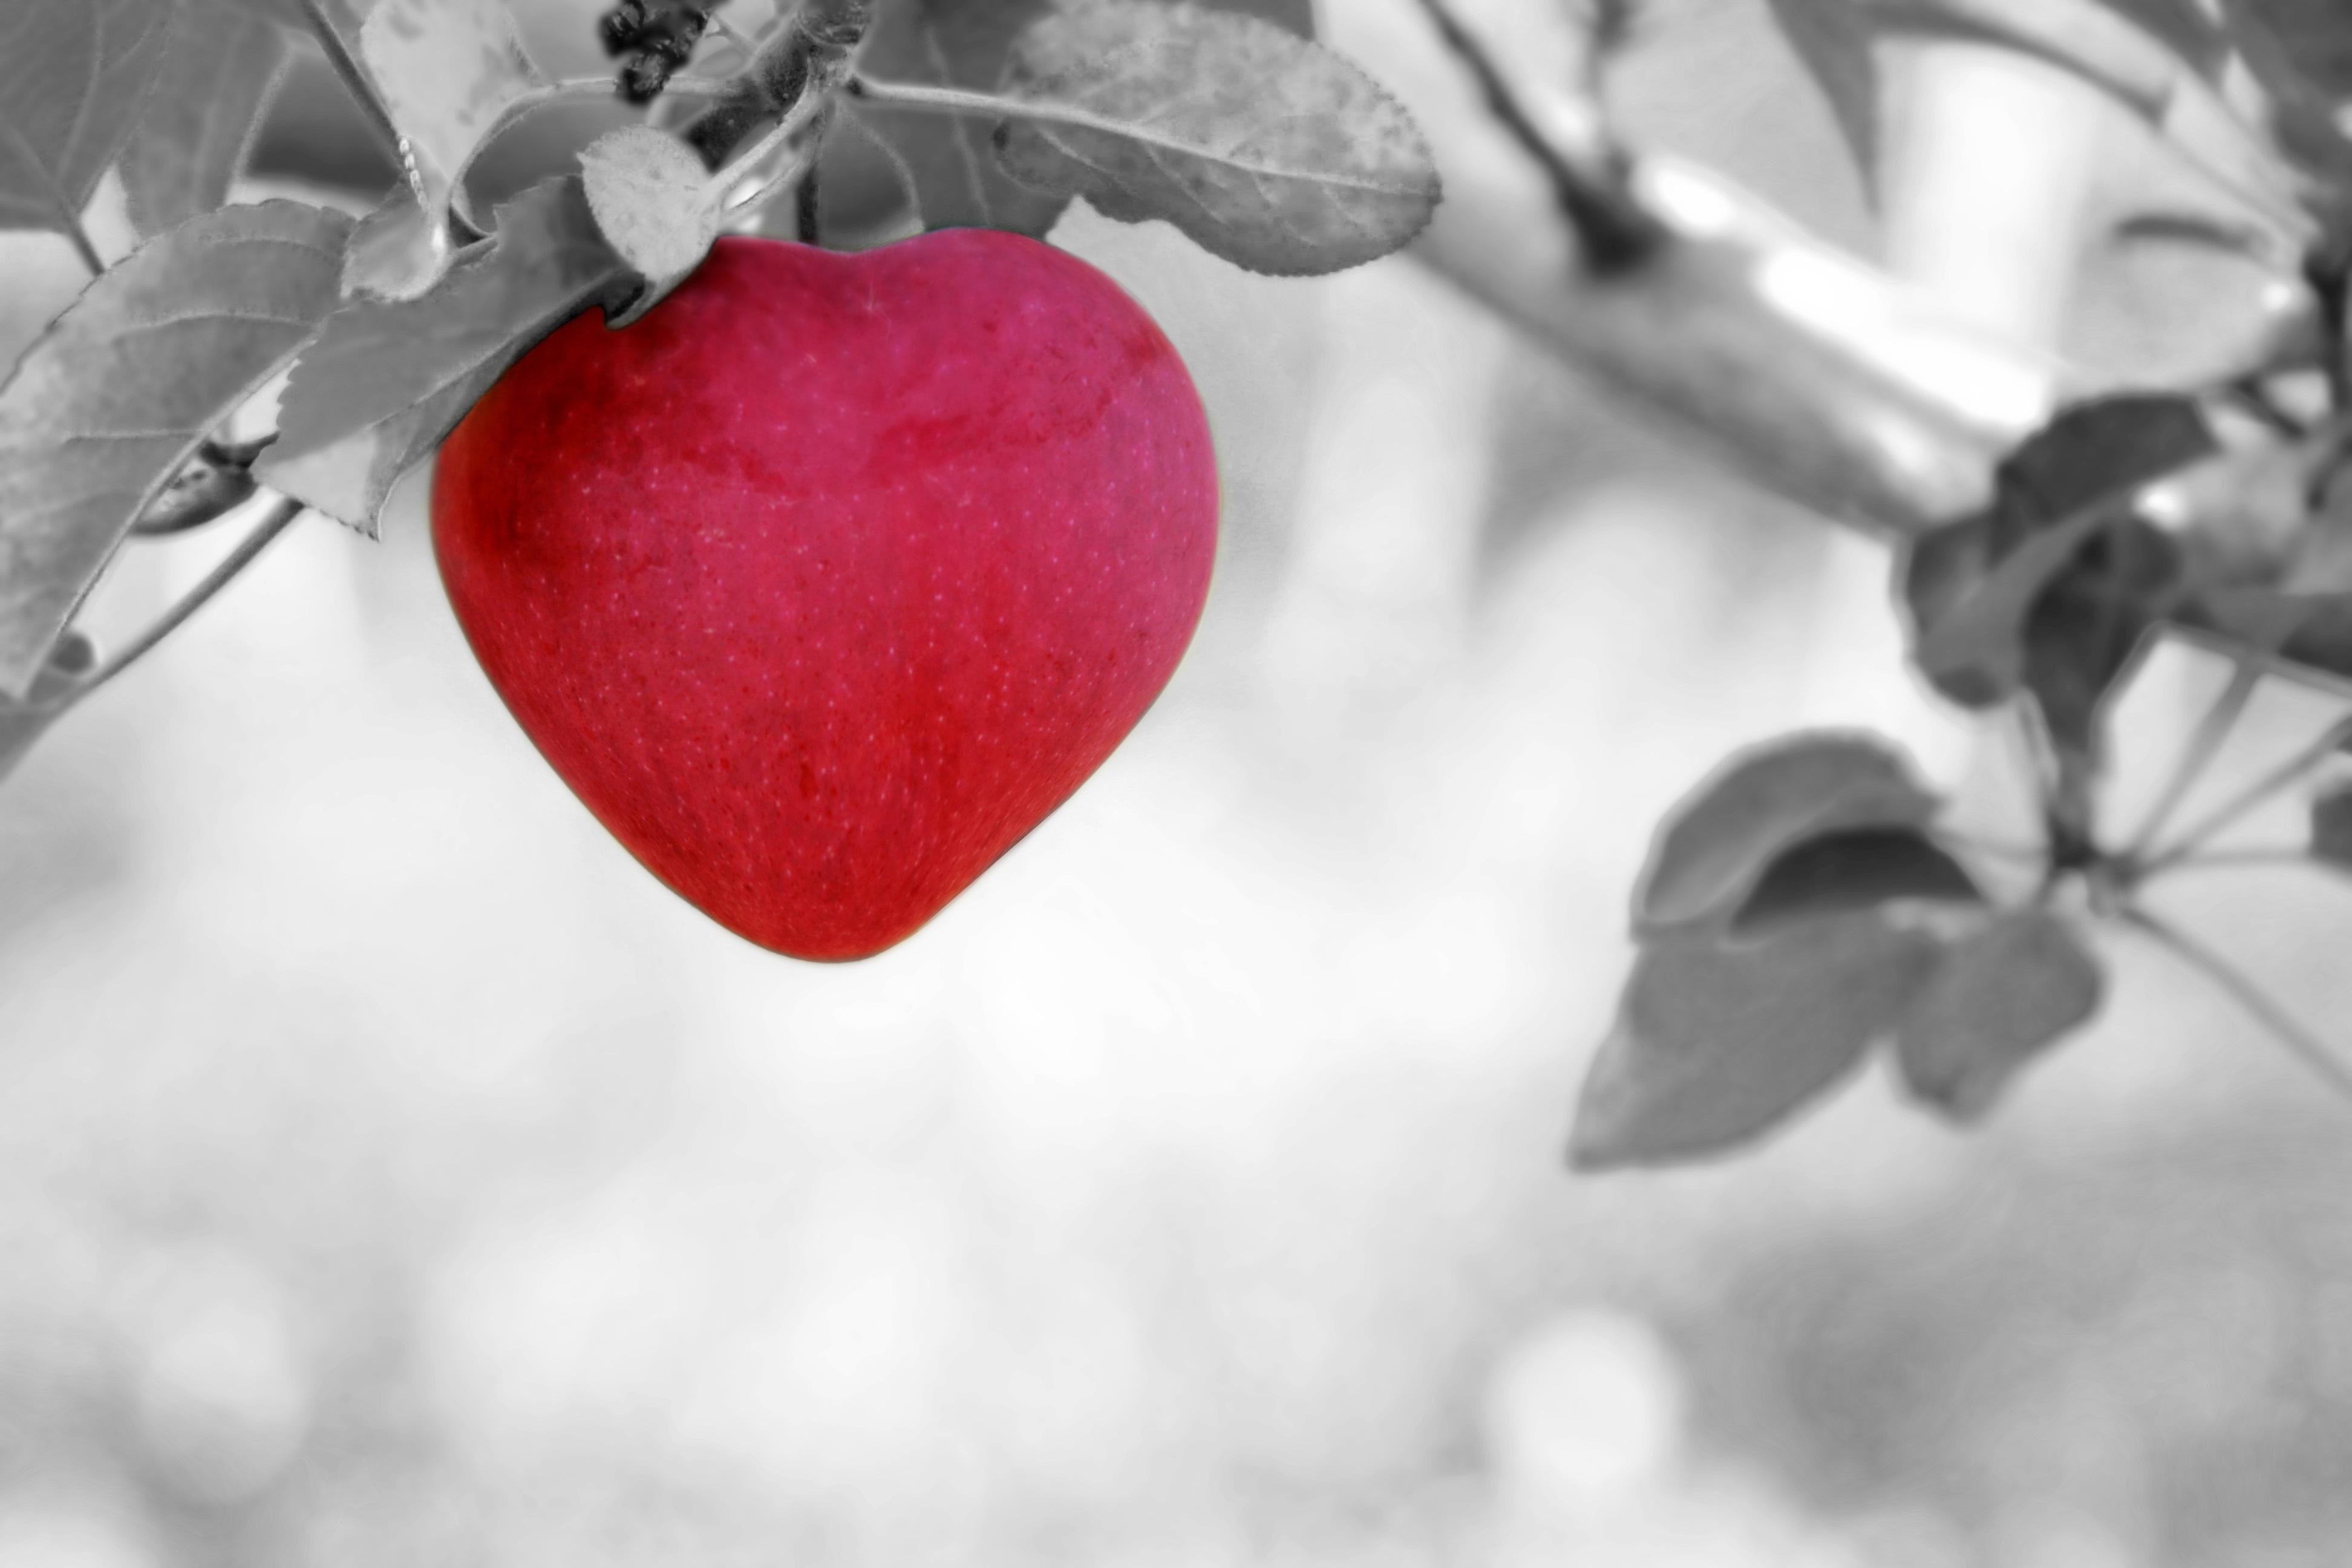 apple-570965